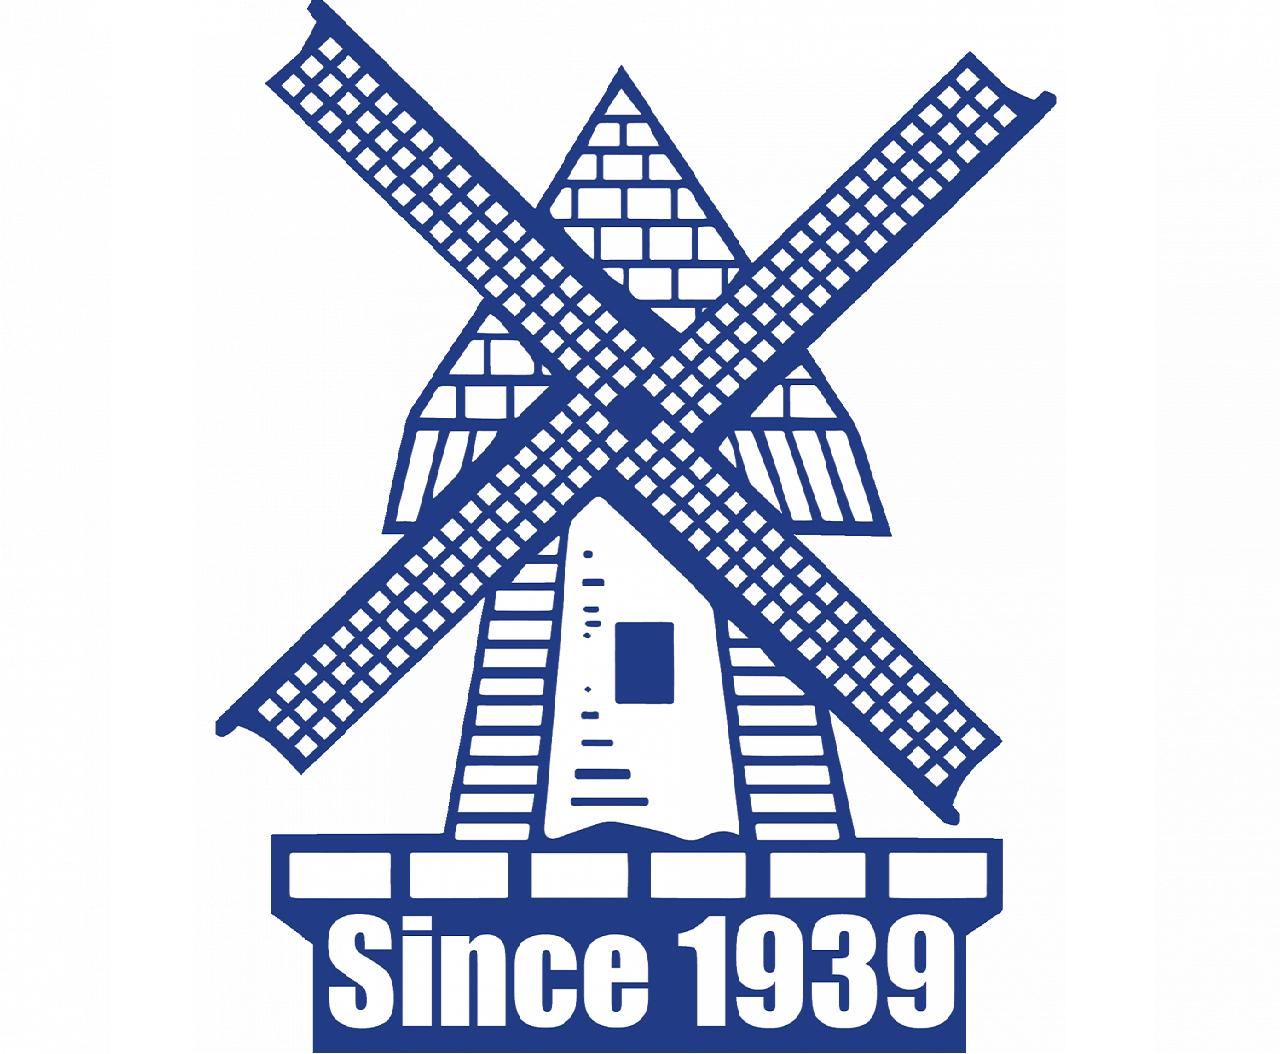 kenworth t2000 price 350 00 [ 1280 x 960 Pixel ]